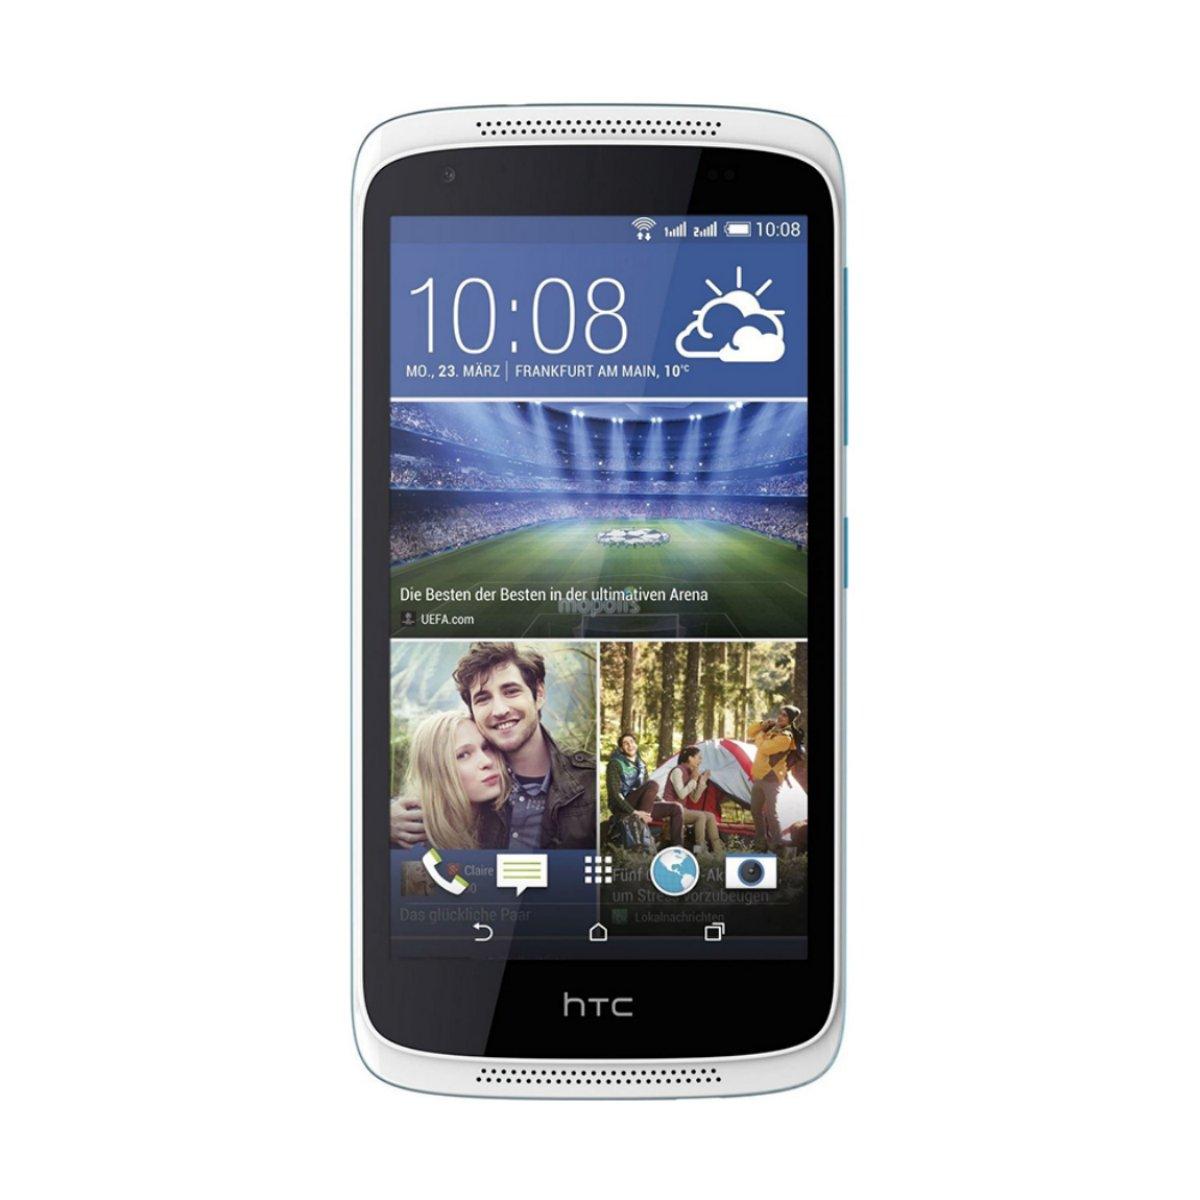 htc desire 526g white glacire blue smart phone. Black Bedroom Furniture Sets. Home Design Ideas